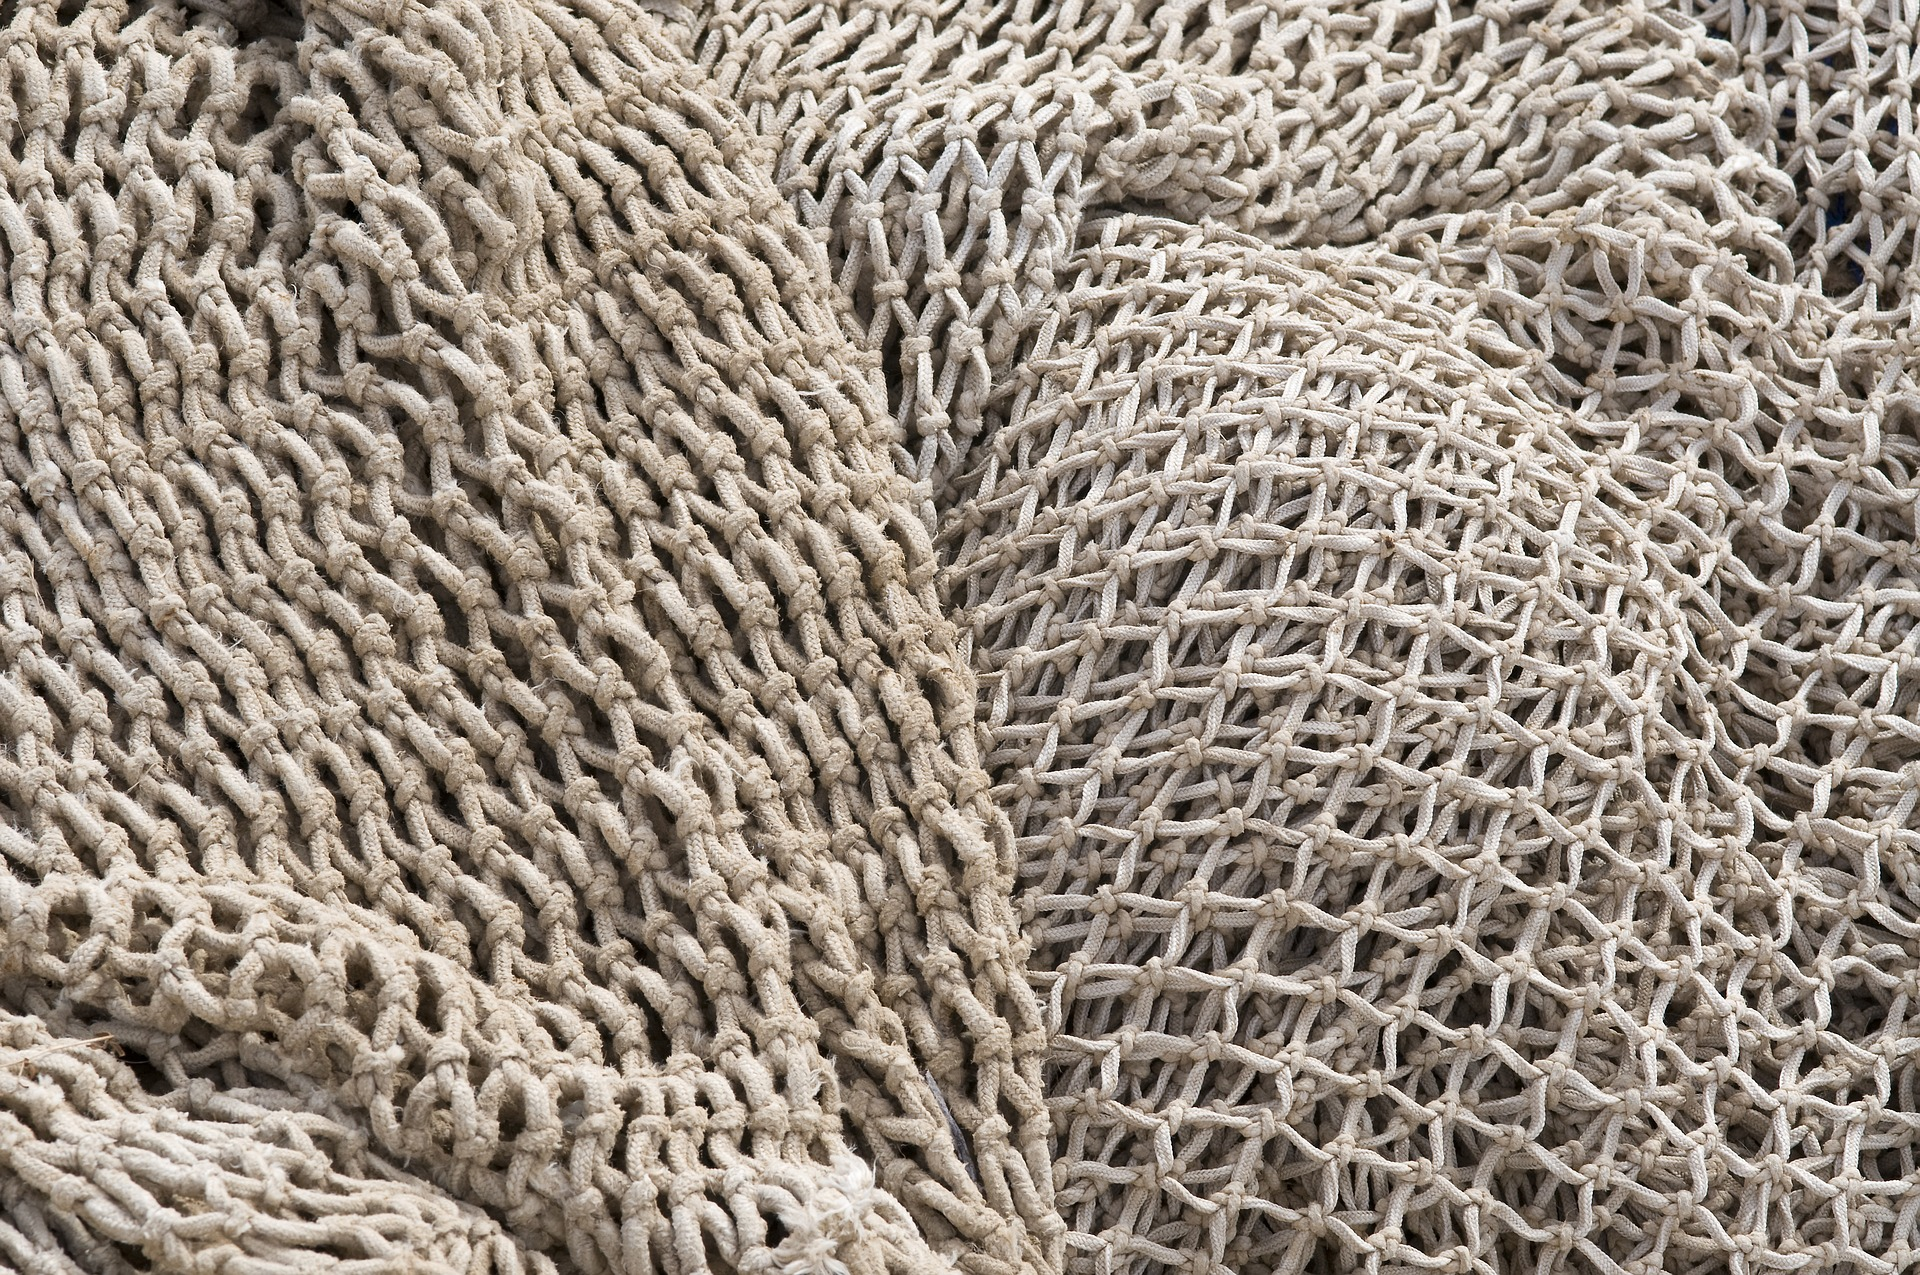 fishing-nets-3341187_1920